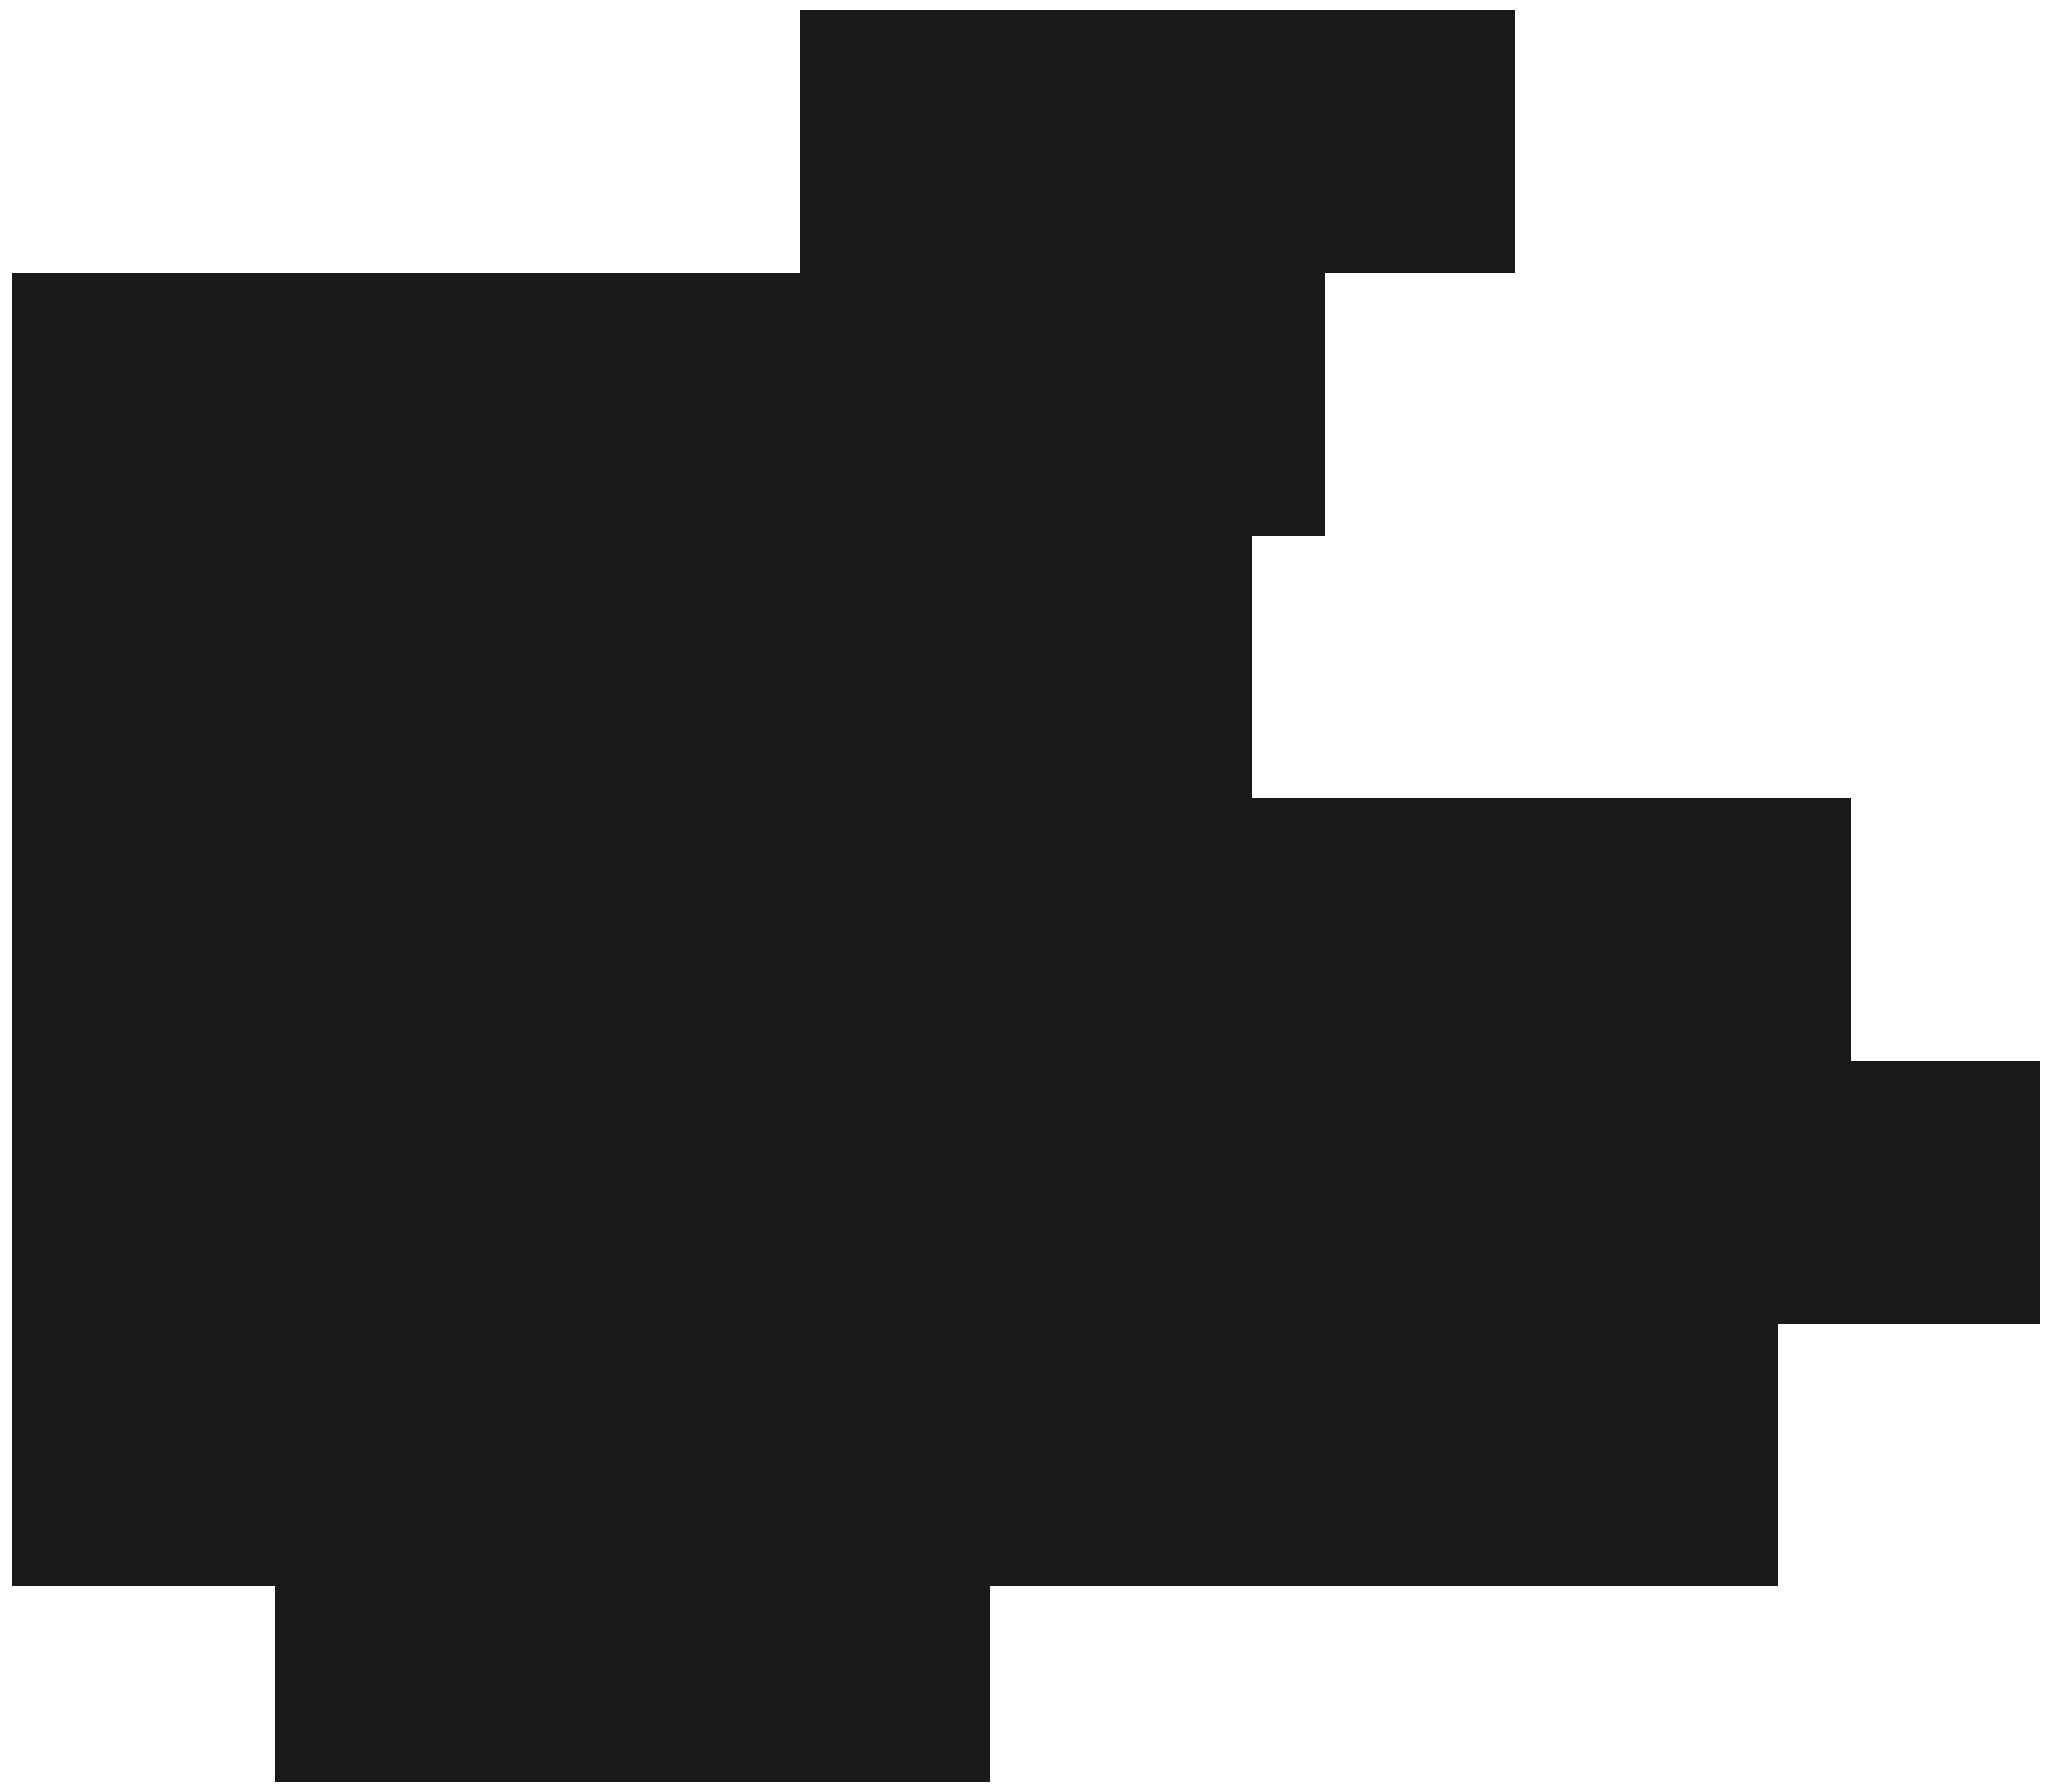 Vintagecupid clipart image download Vintage Cupid Transparent Image   Gallery Yopriceville ... image download